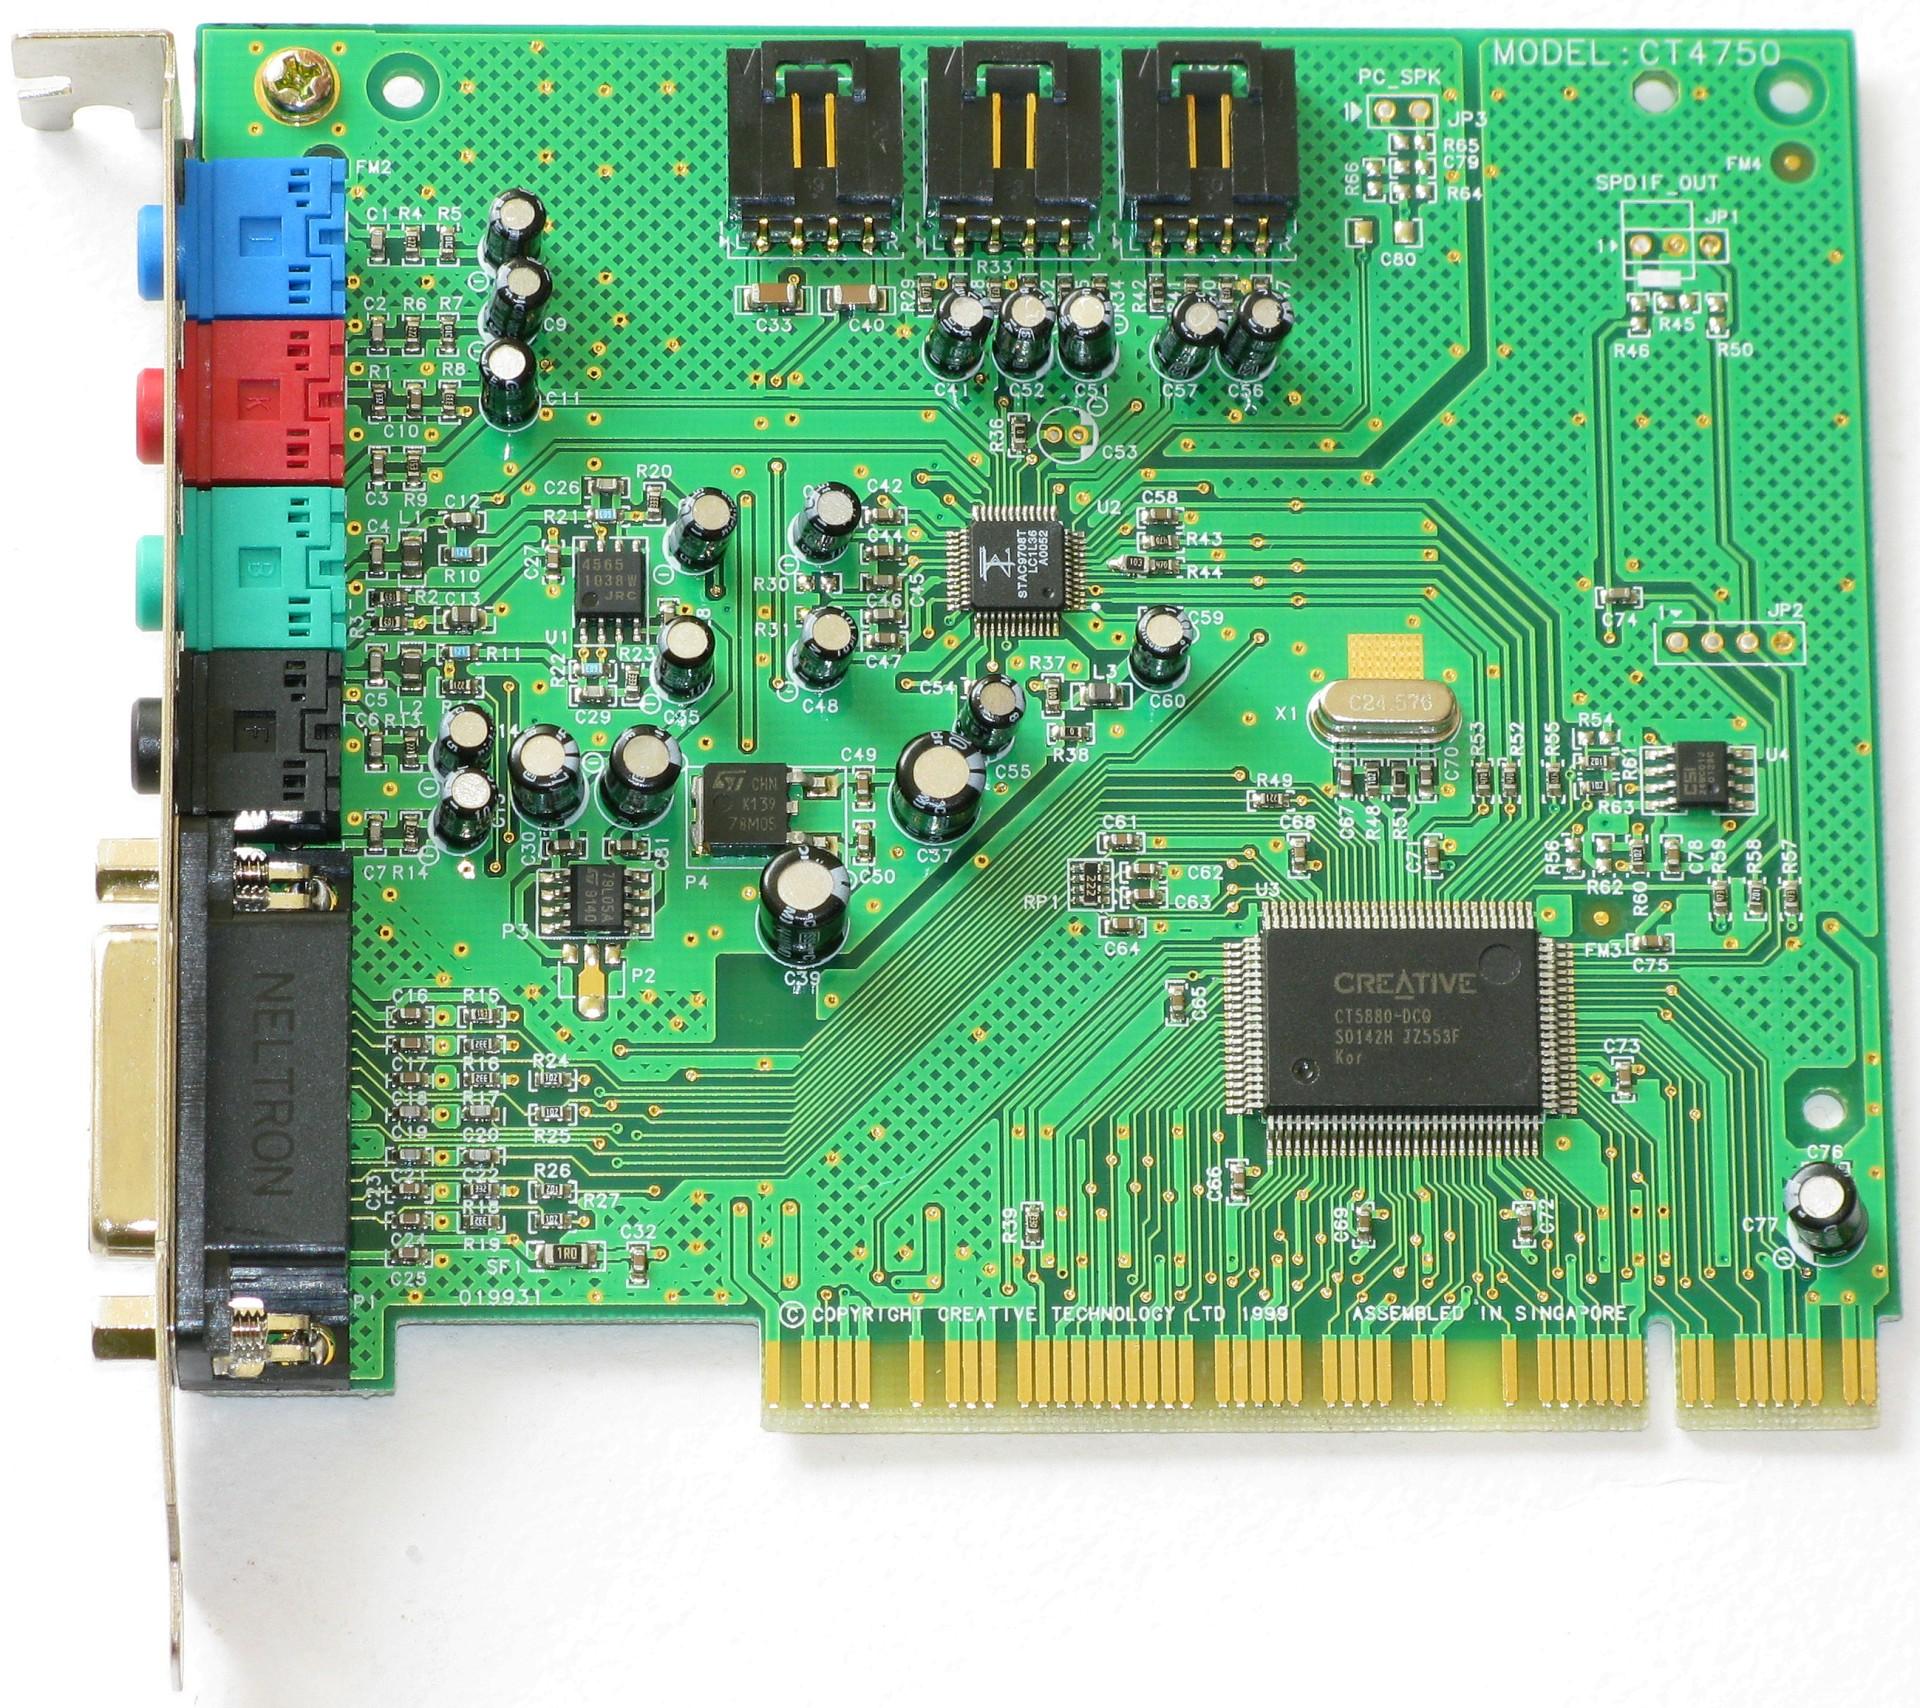 CREATIVE LABS CT5880 WINDOWS XP DRIVER